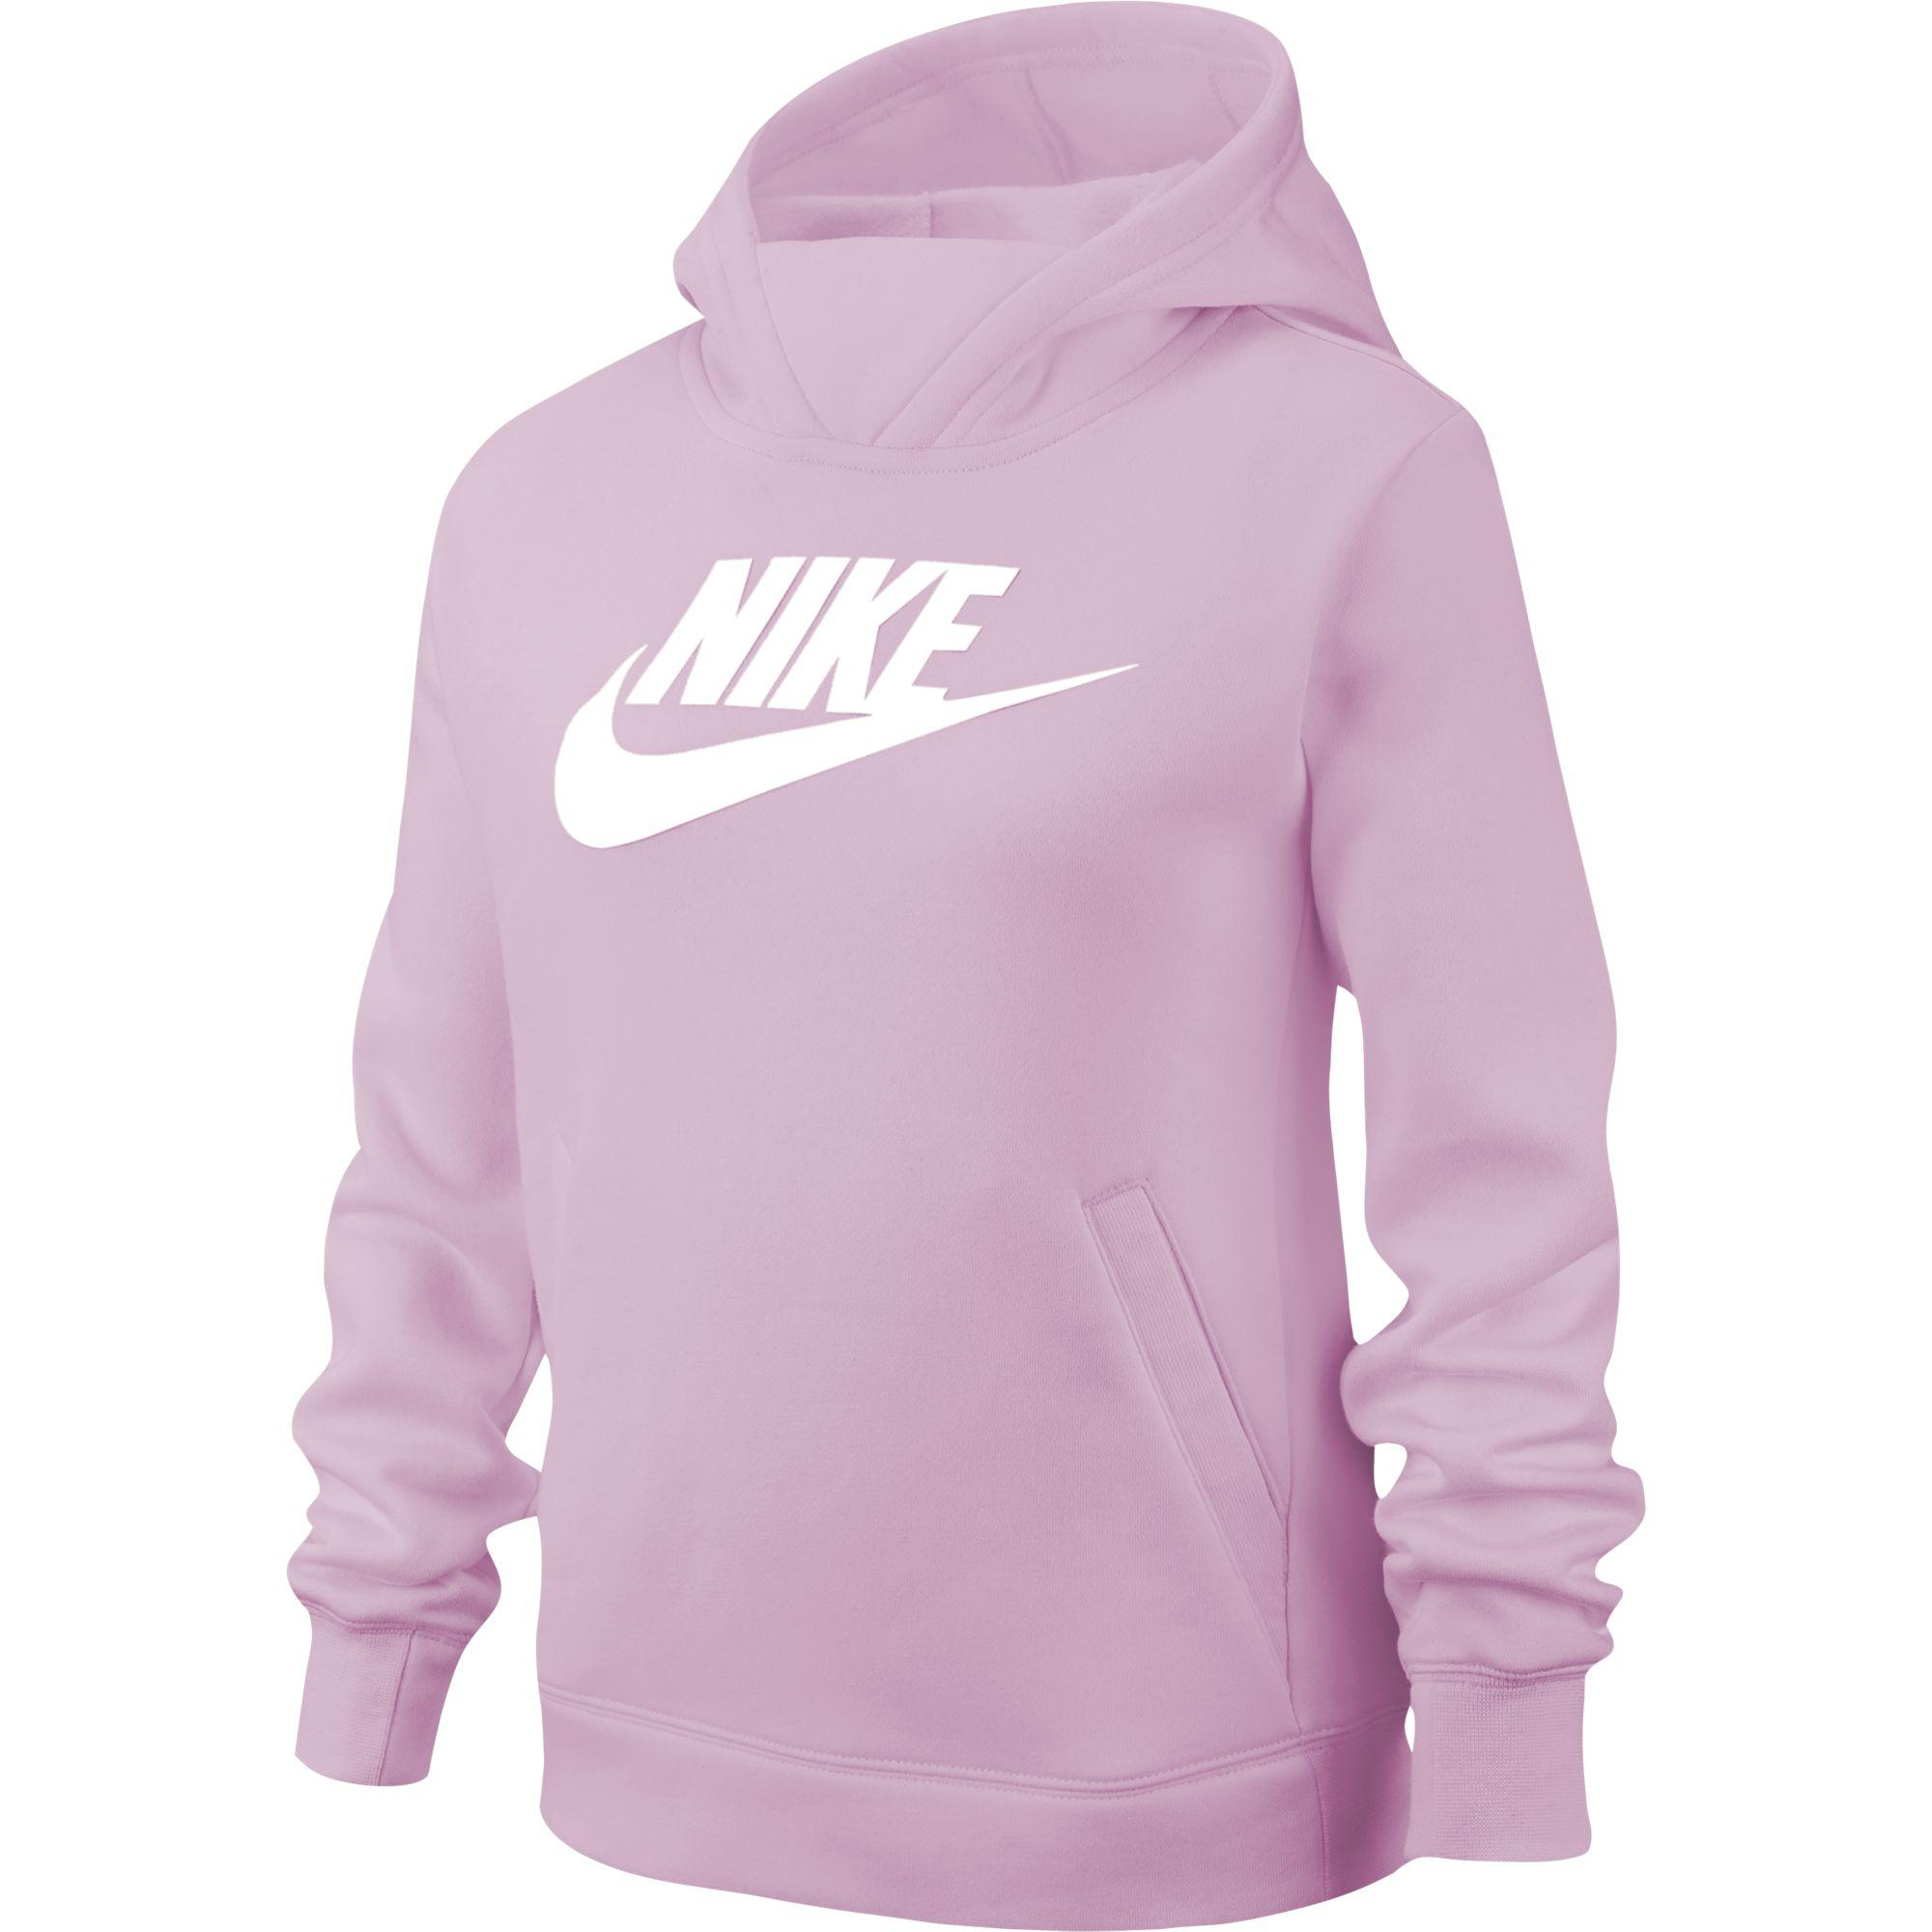 Girls' Sportswear Pullover Hoodie, Pink, swatch